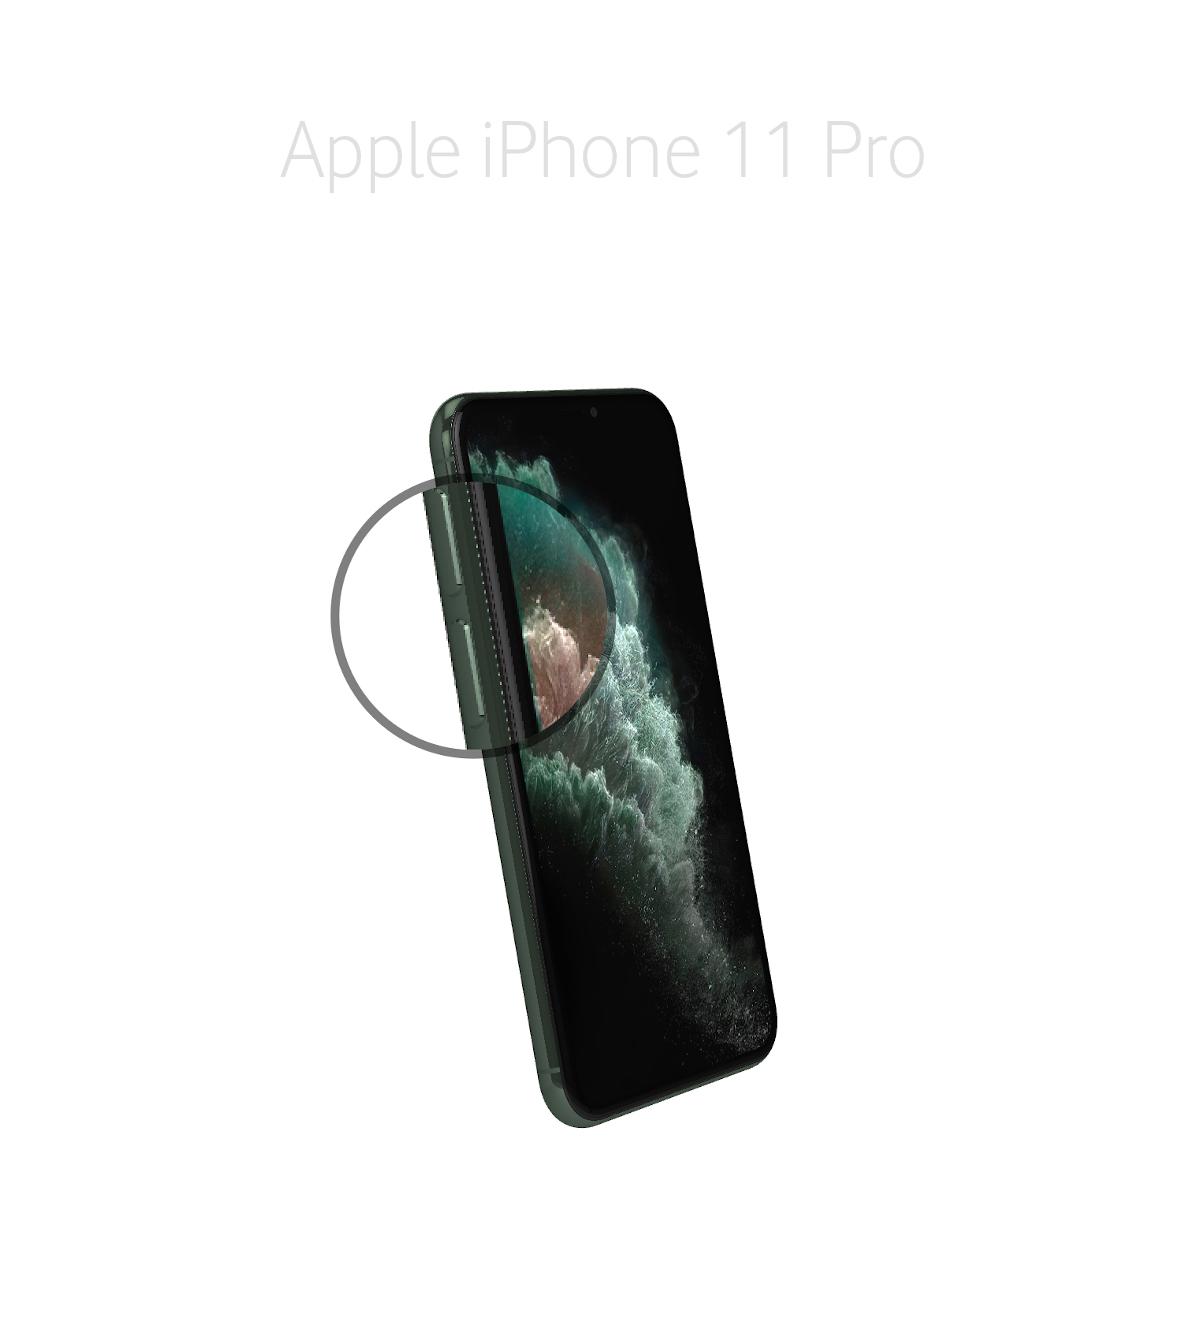 Laga volym/muteknapp iPhone 11 Pro